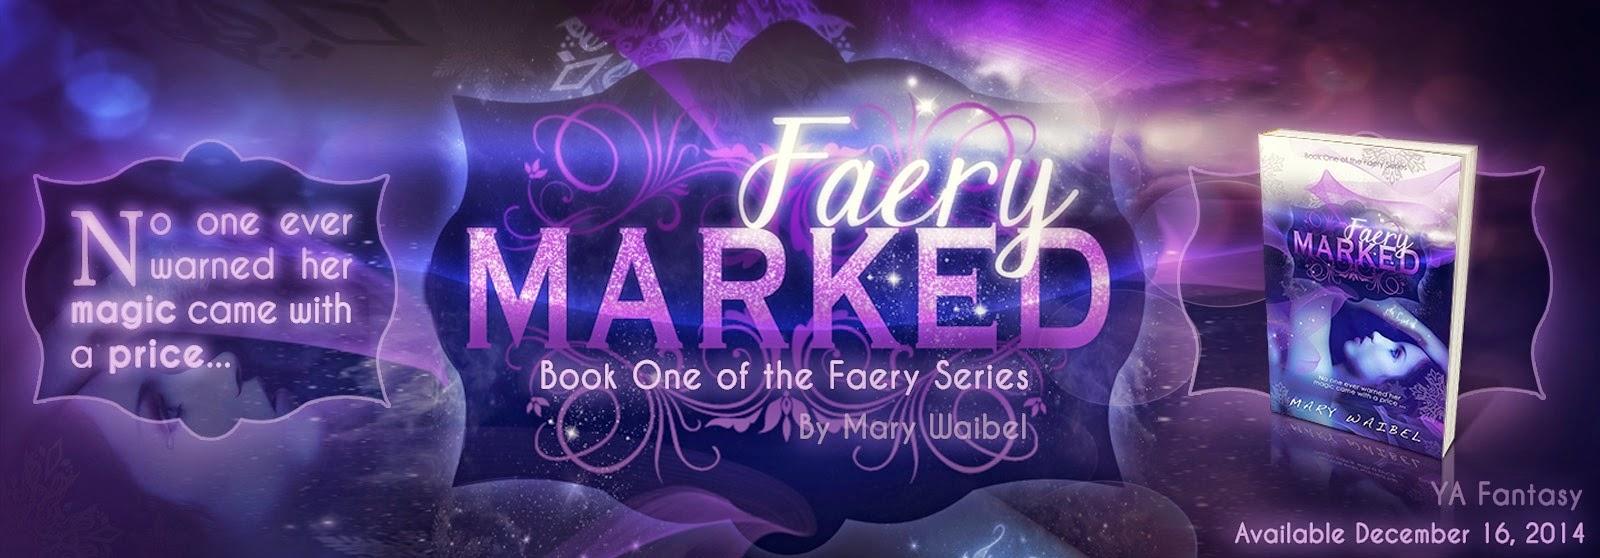 Mary Waibel Faery Marked: Casting Call